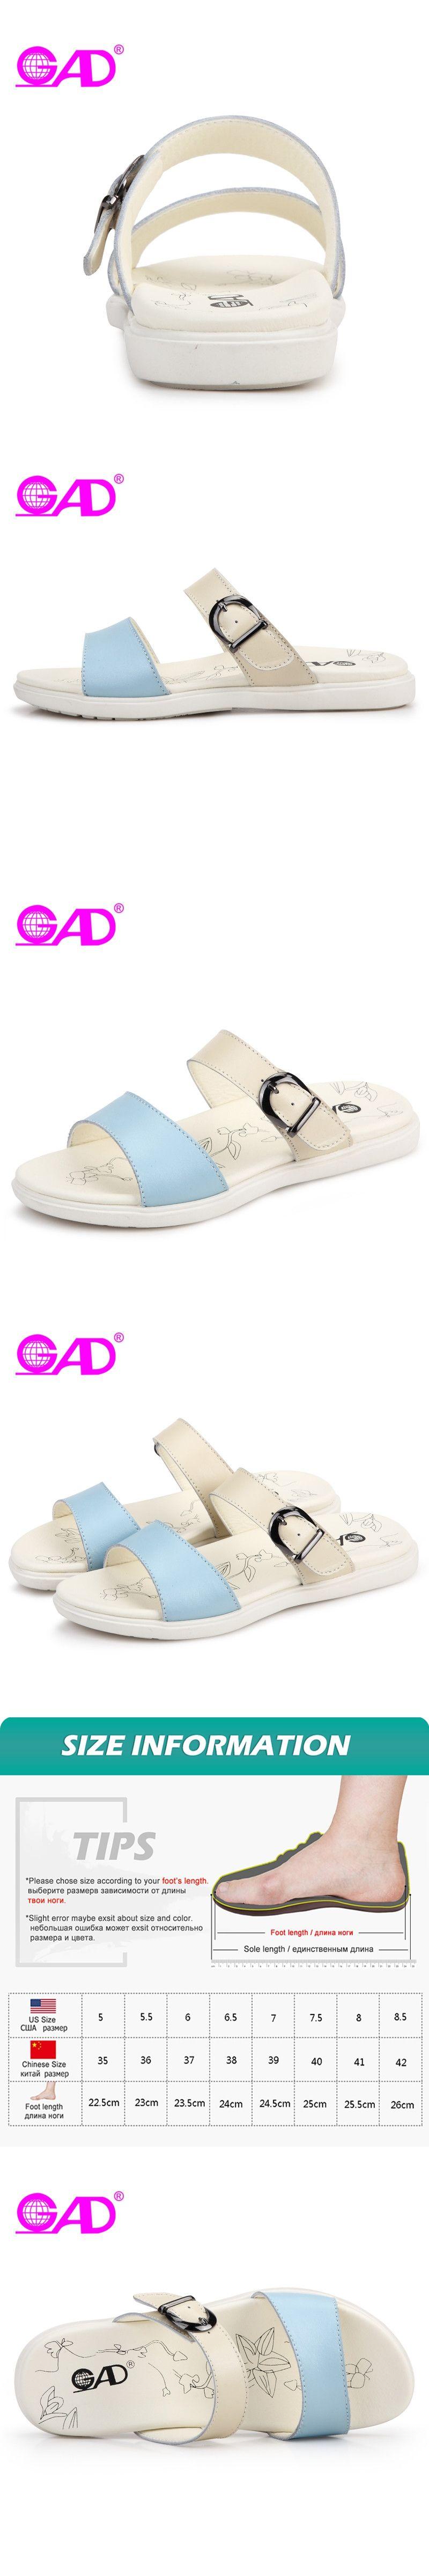 6840a85a897a GAD Women Summer Slippers Fashion Design Metal Buckle Open Toe Breathable  Women Beach Slides Simple Wild